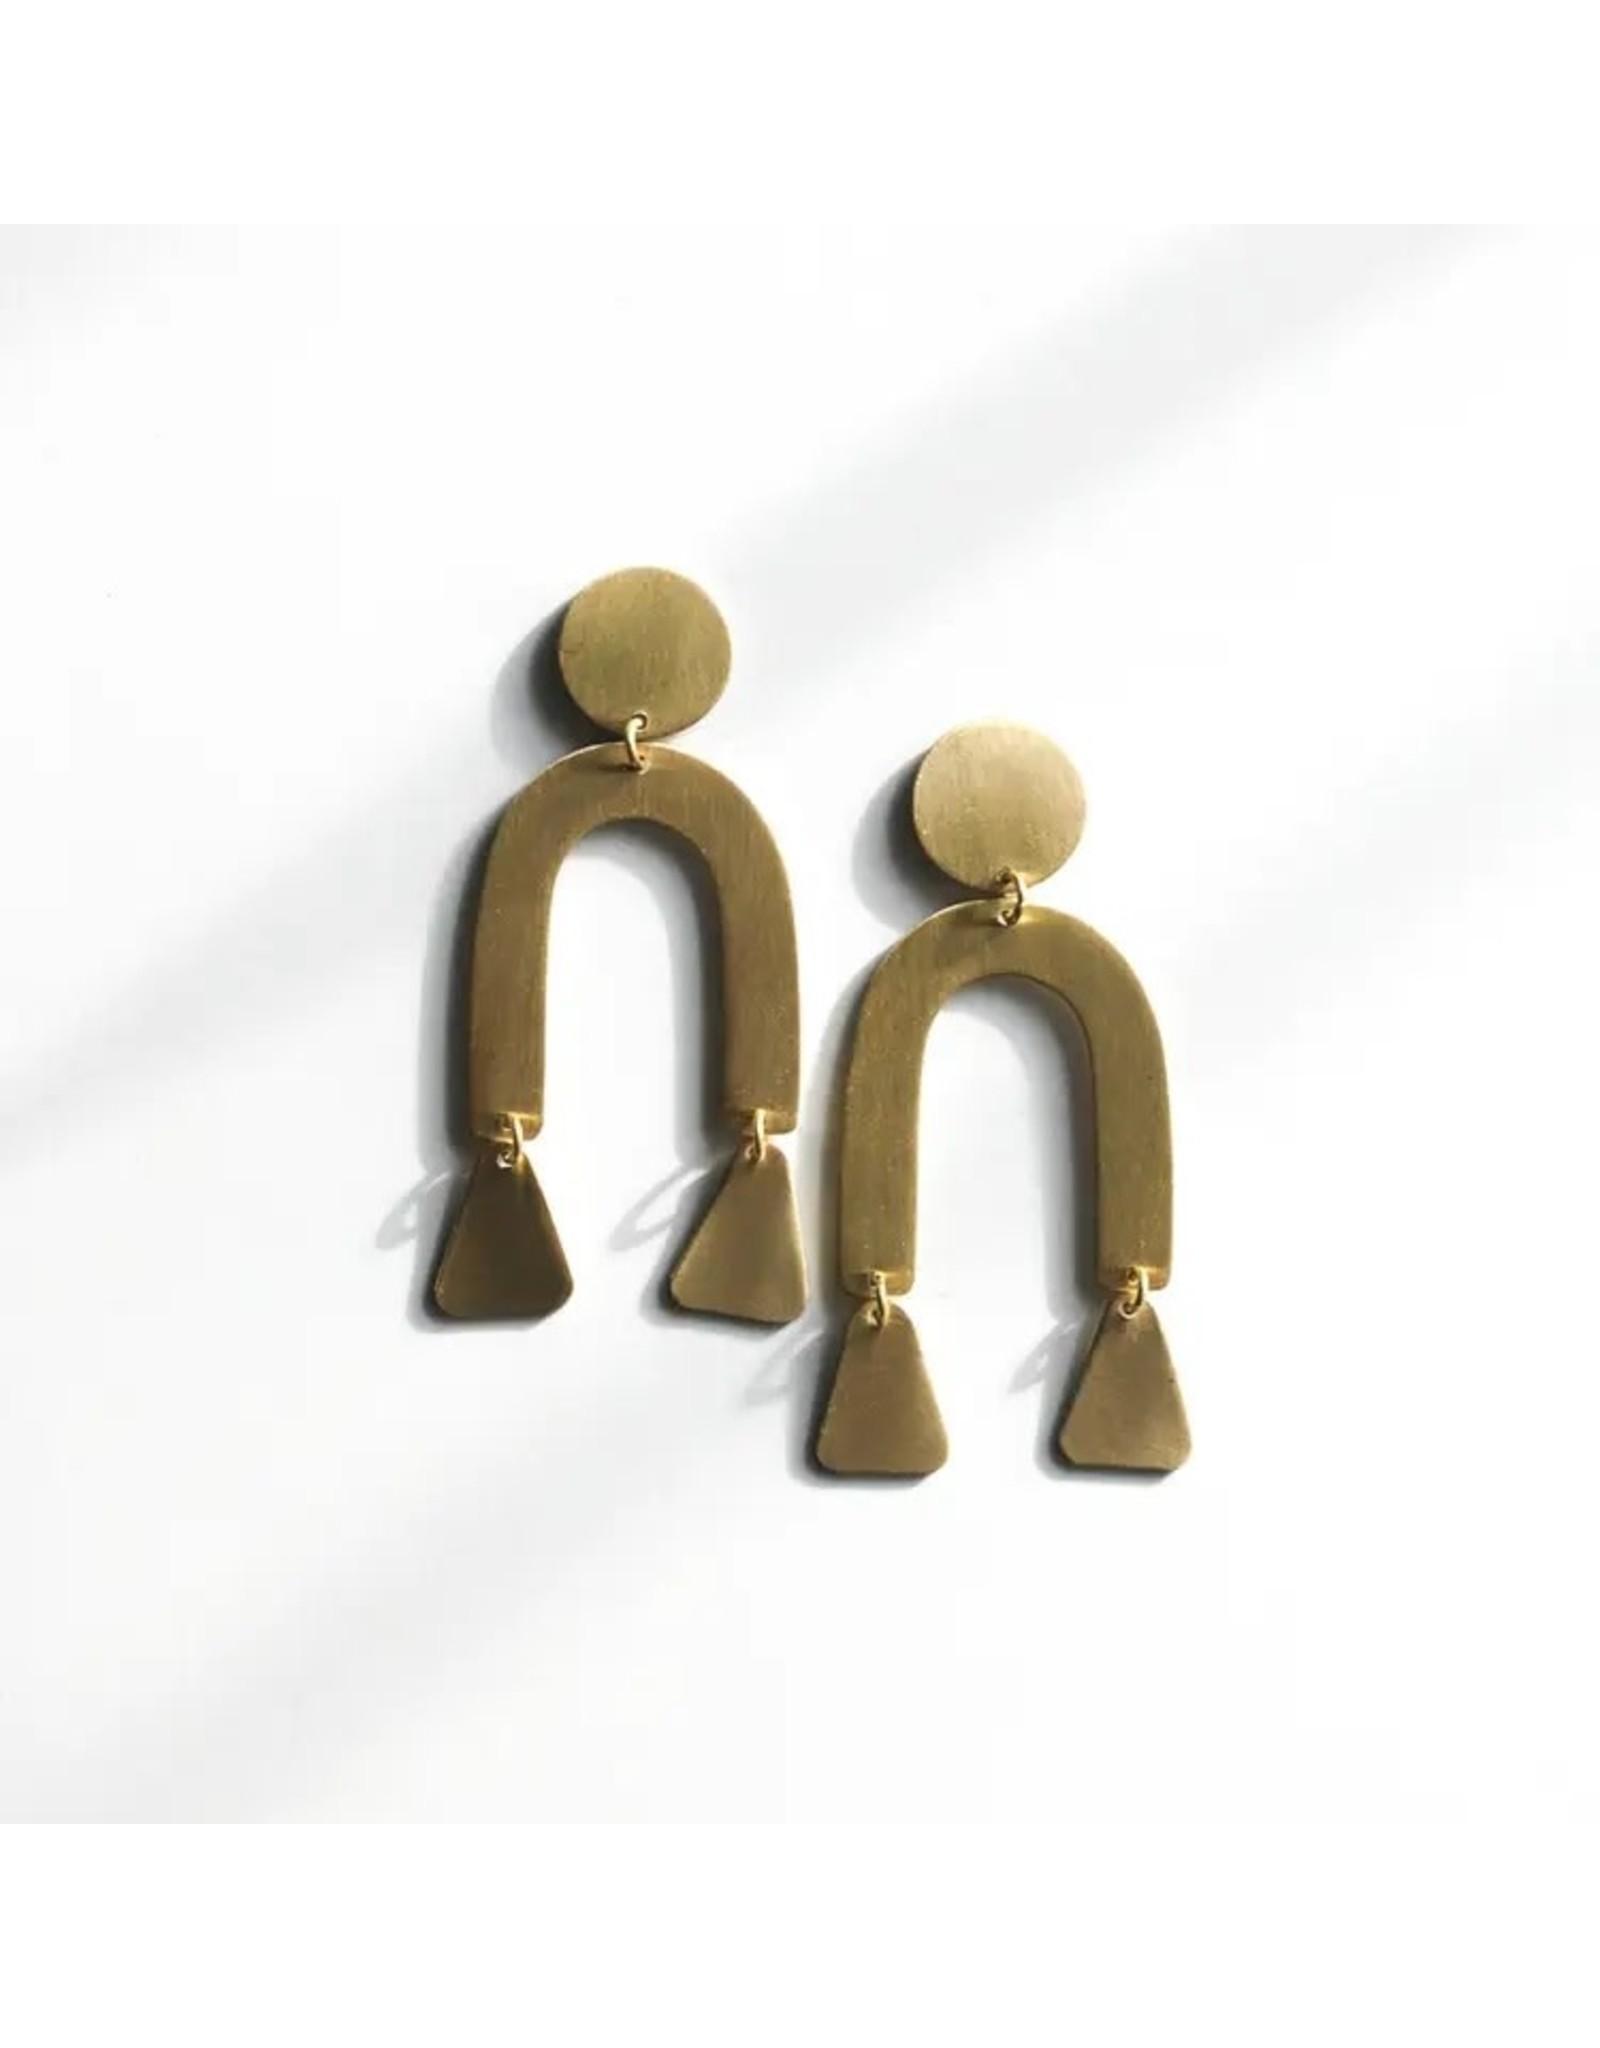 Rover & Kin Modern Shapes Earrings